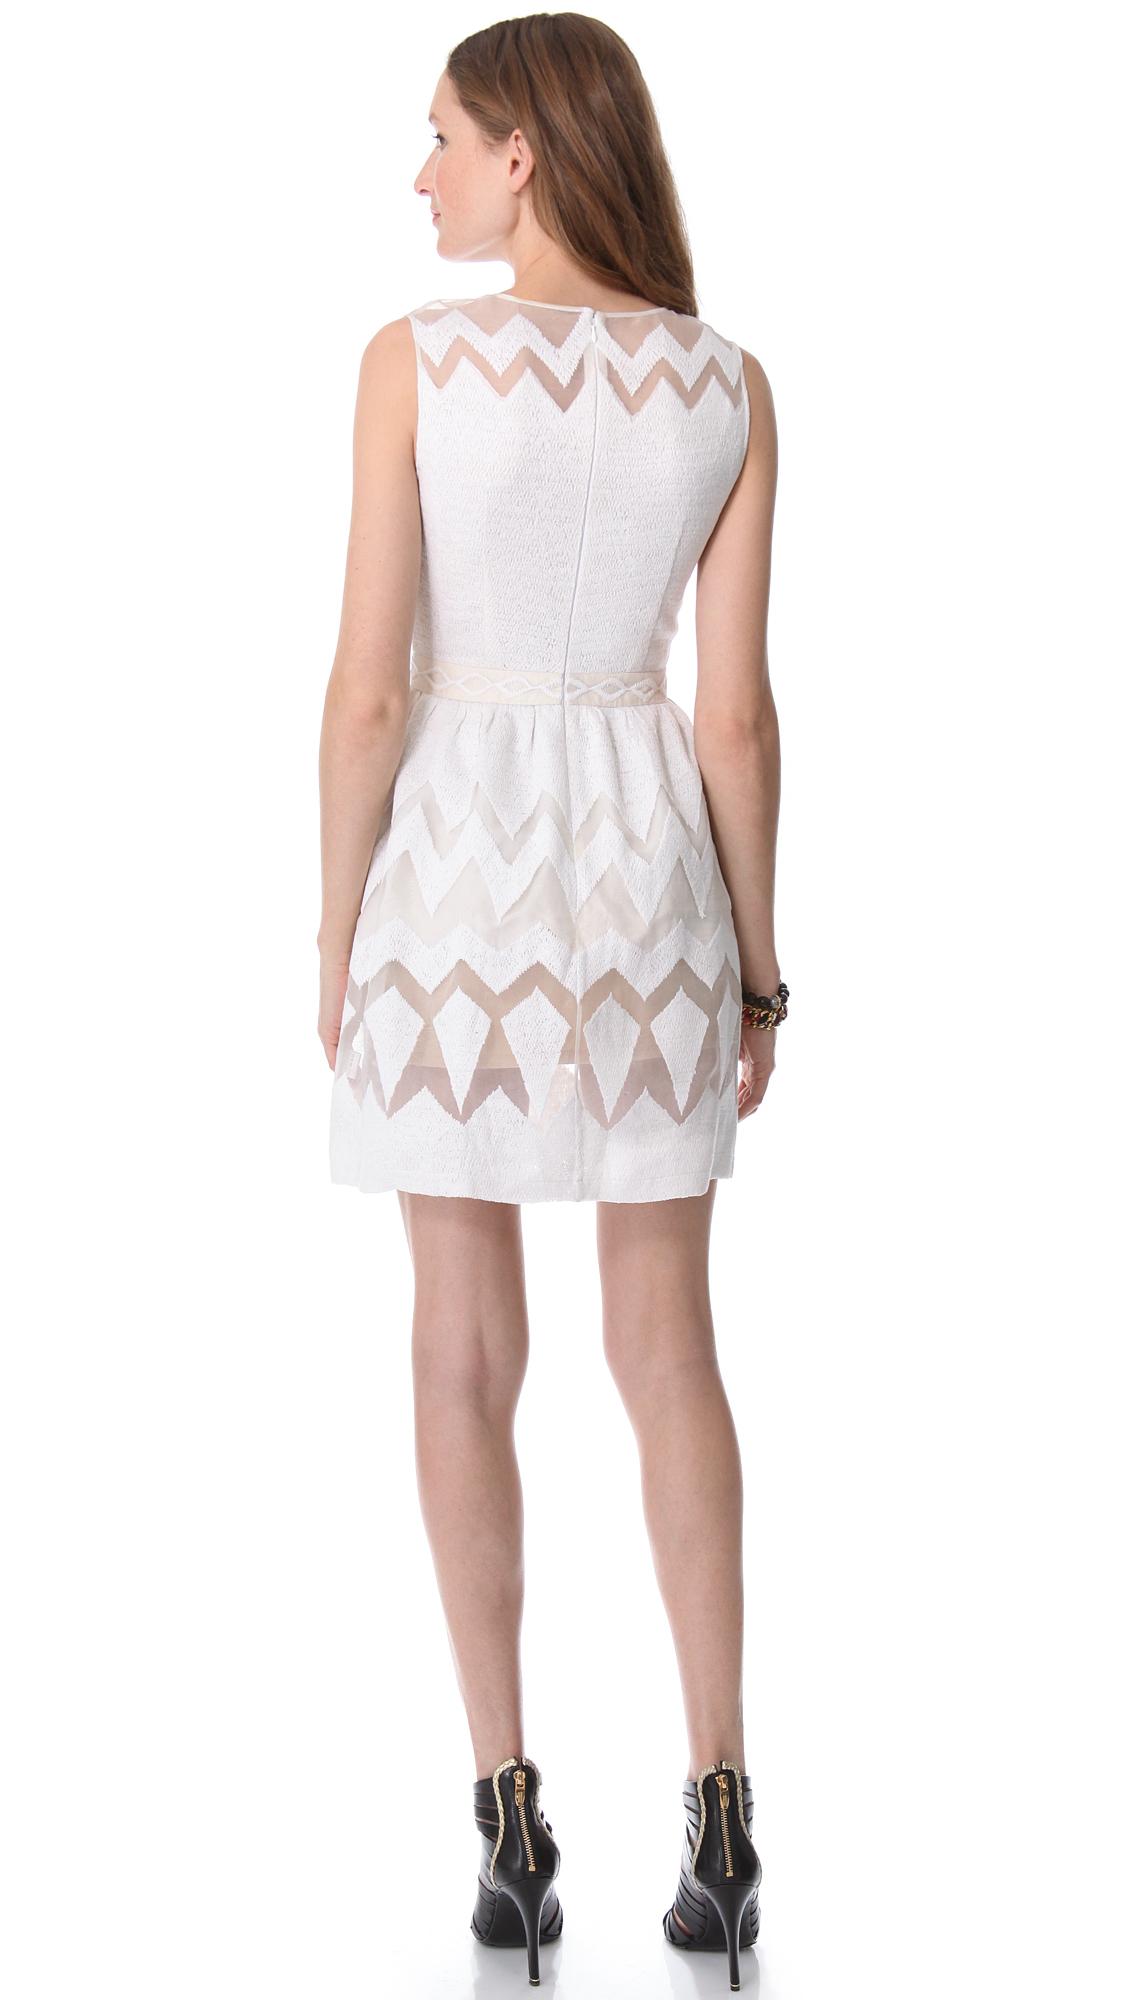 Lyst saloni organza sleeveless dress in white - Salon prestige organza ...